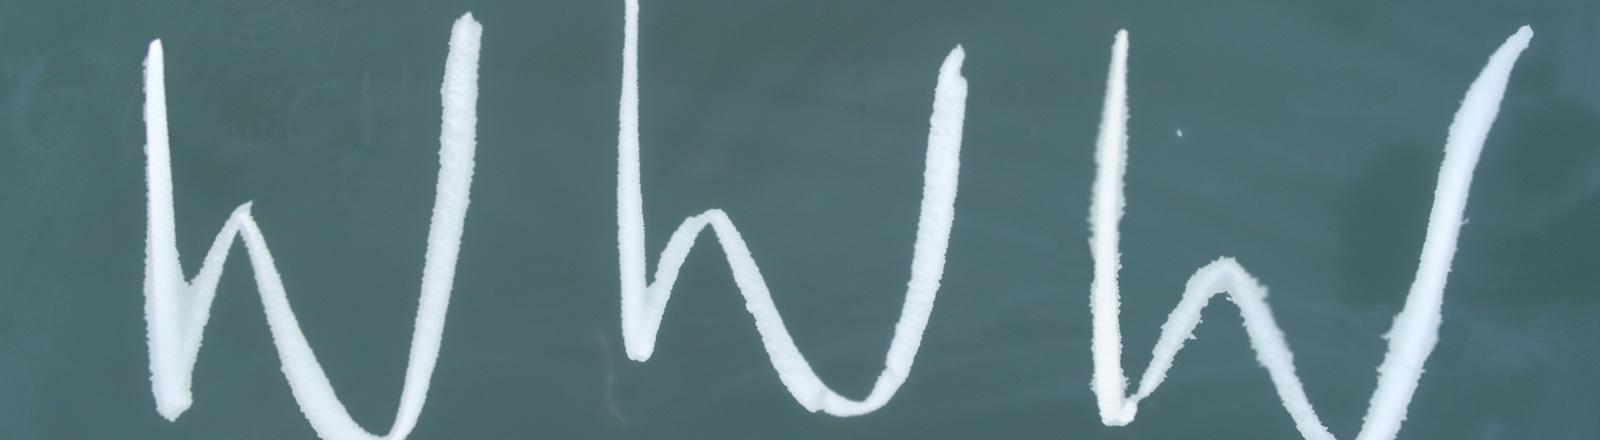 Web-Lektorat